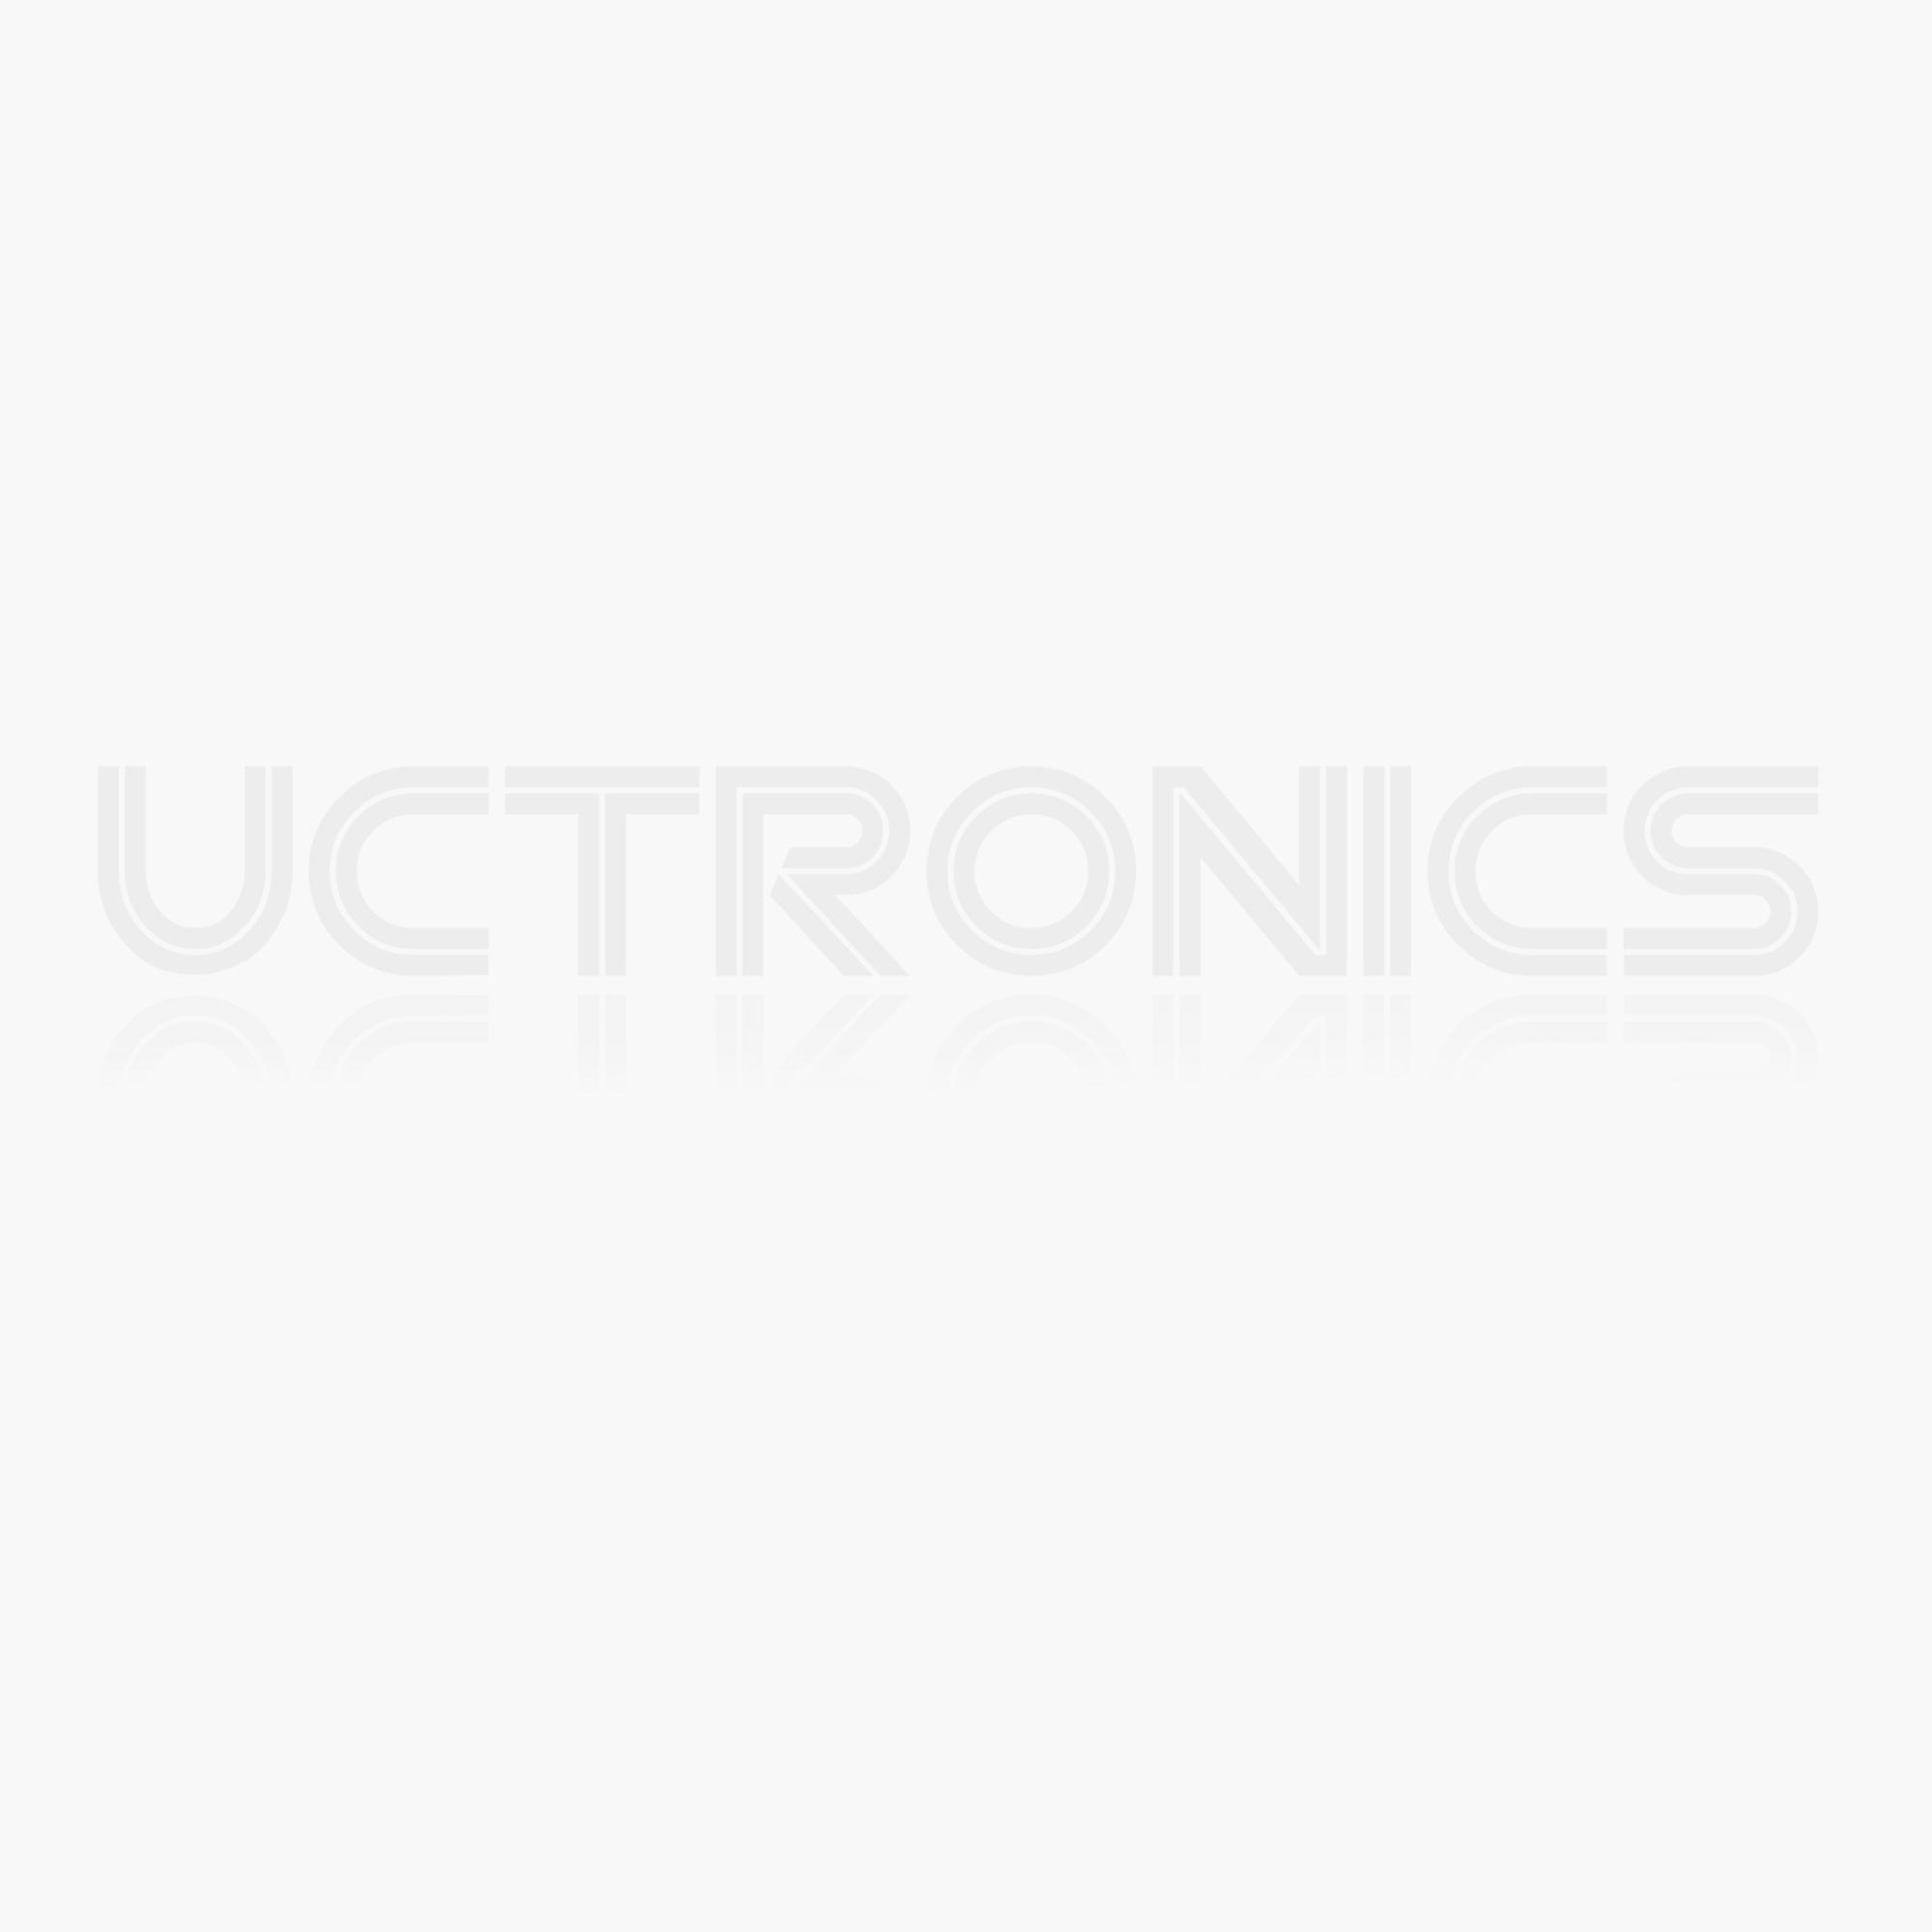 GH312 Smoke Sensor butane propane Gas Sensor Module